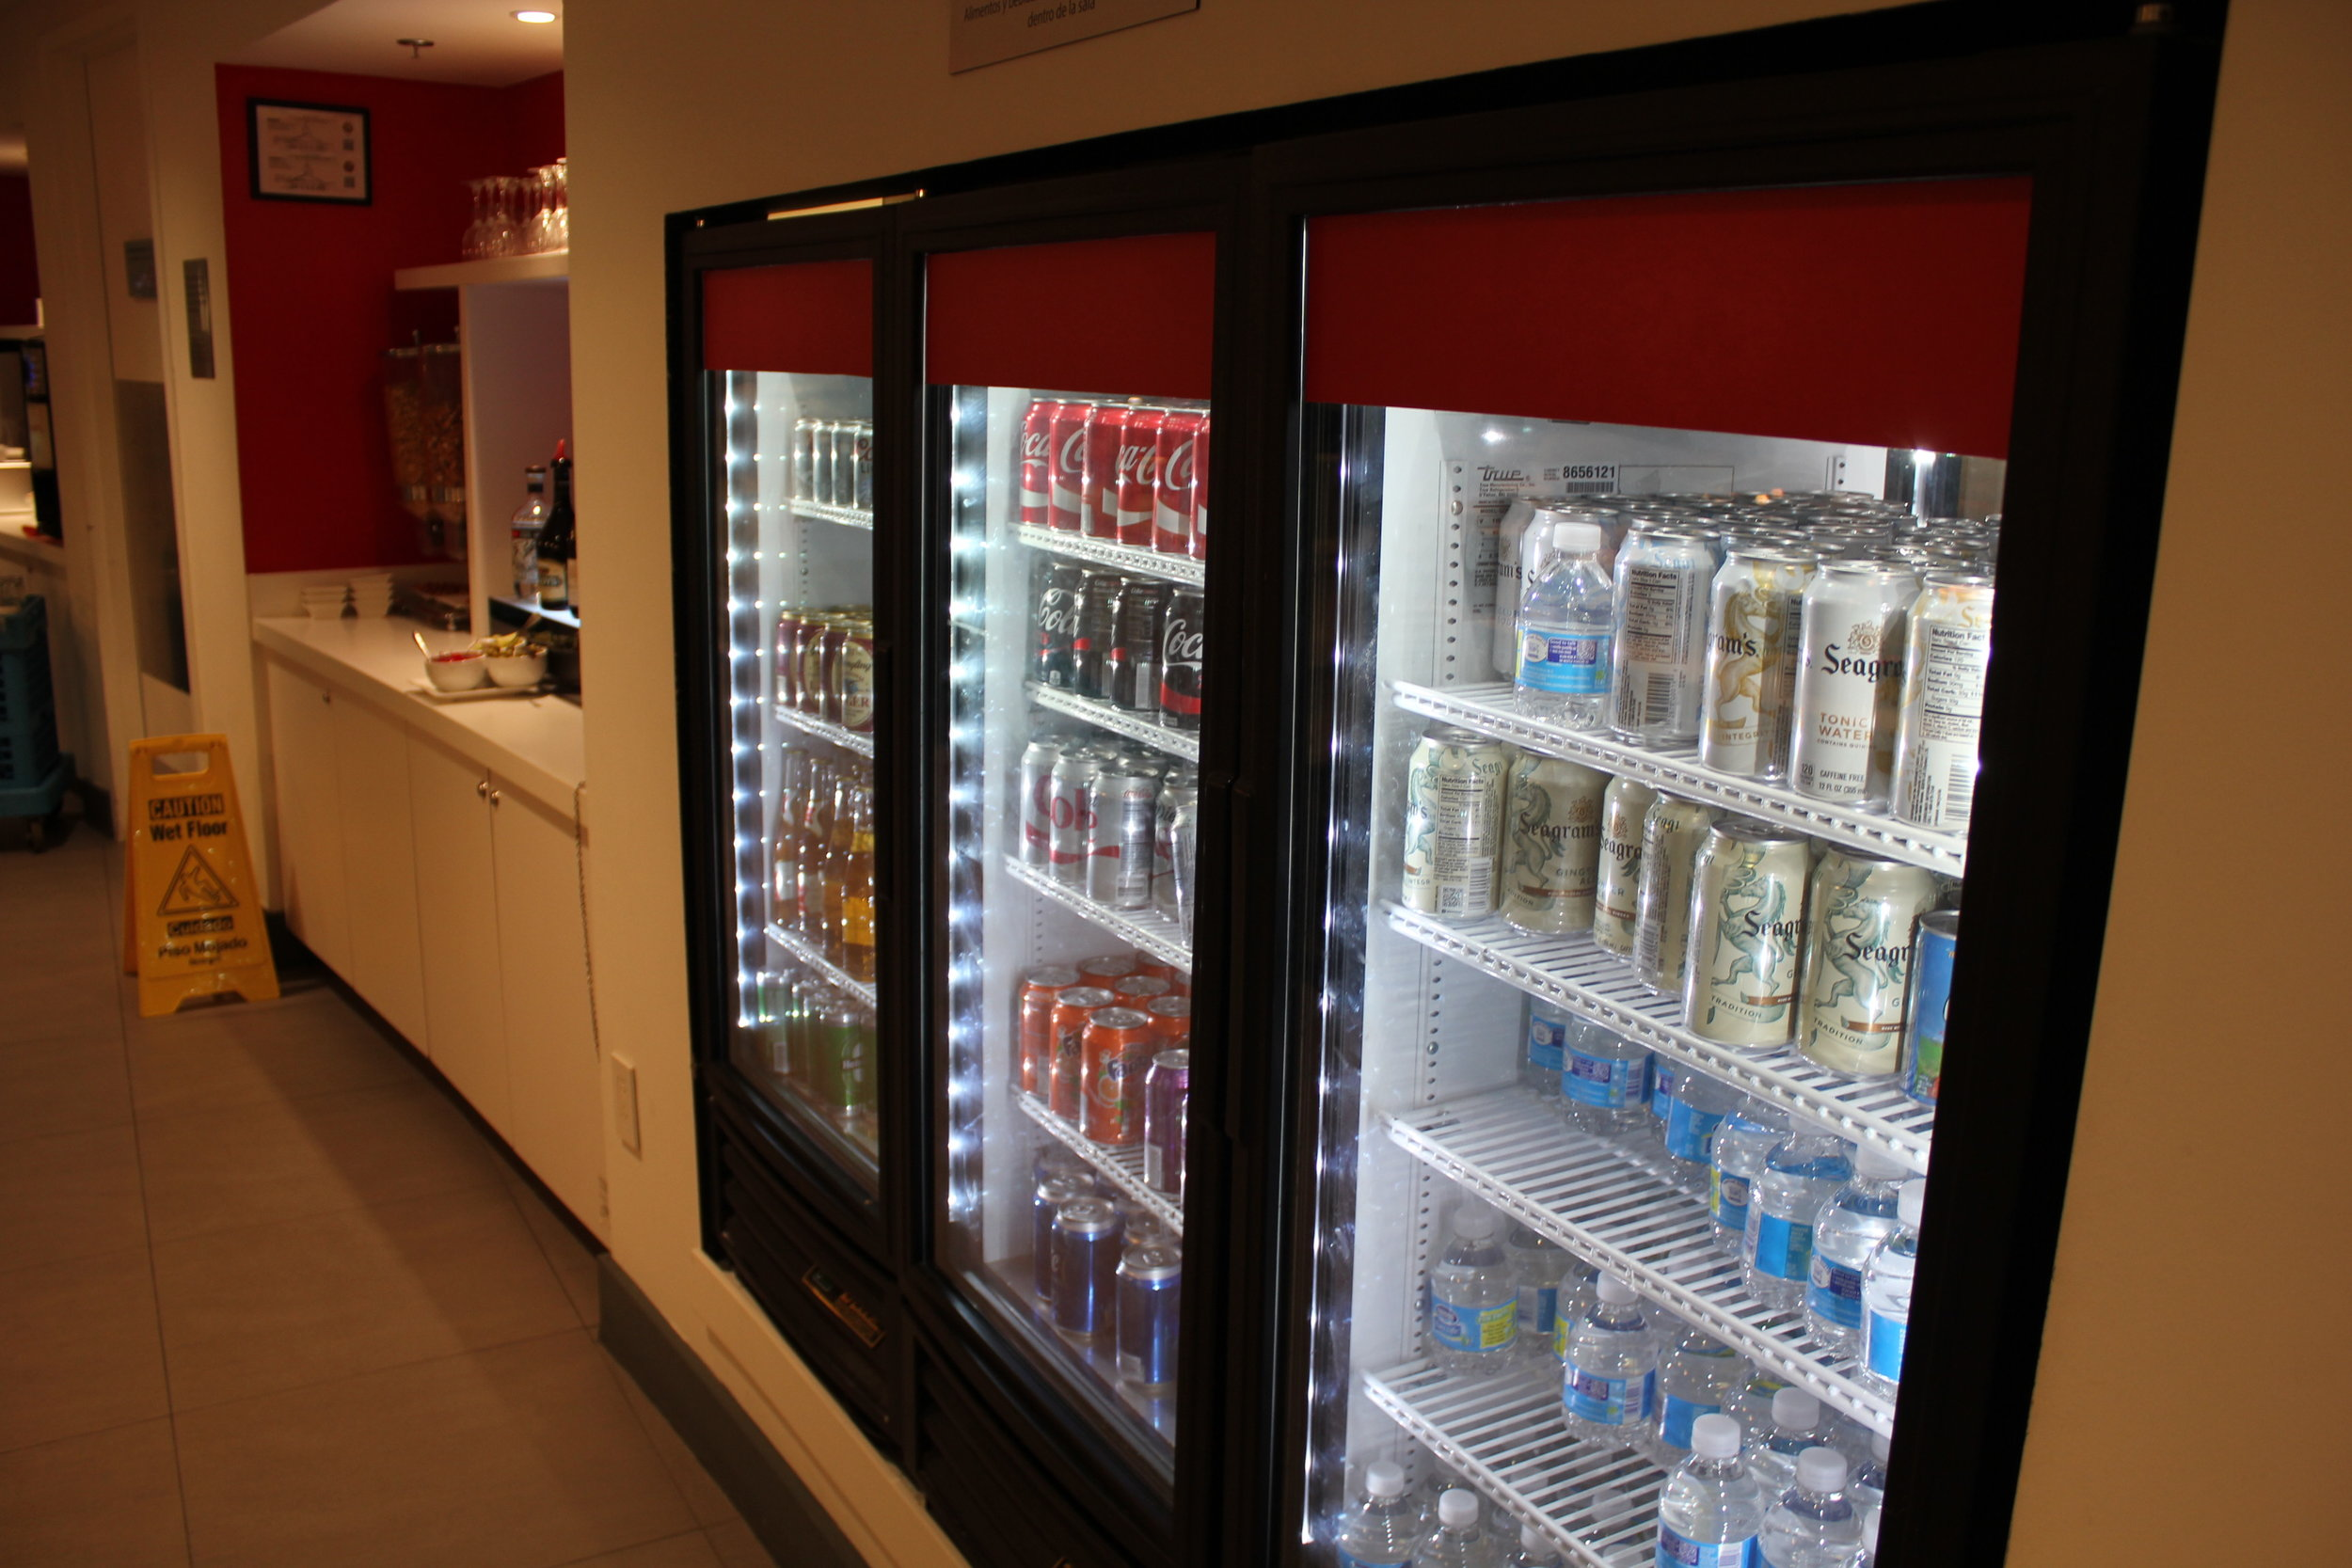 Avianca Lounge Miami – Cold drinks